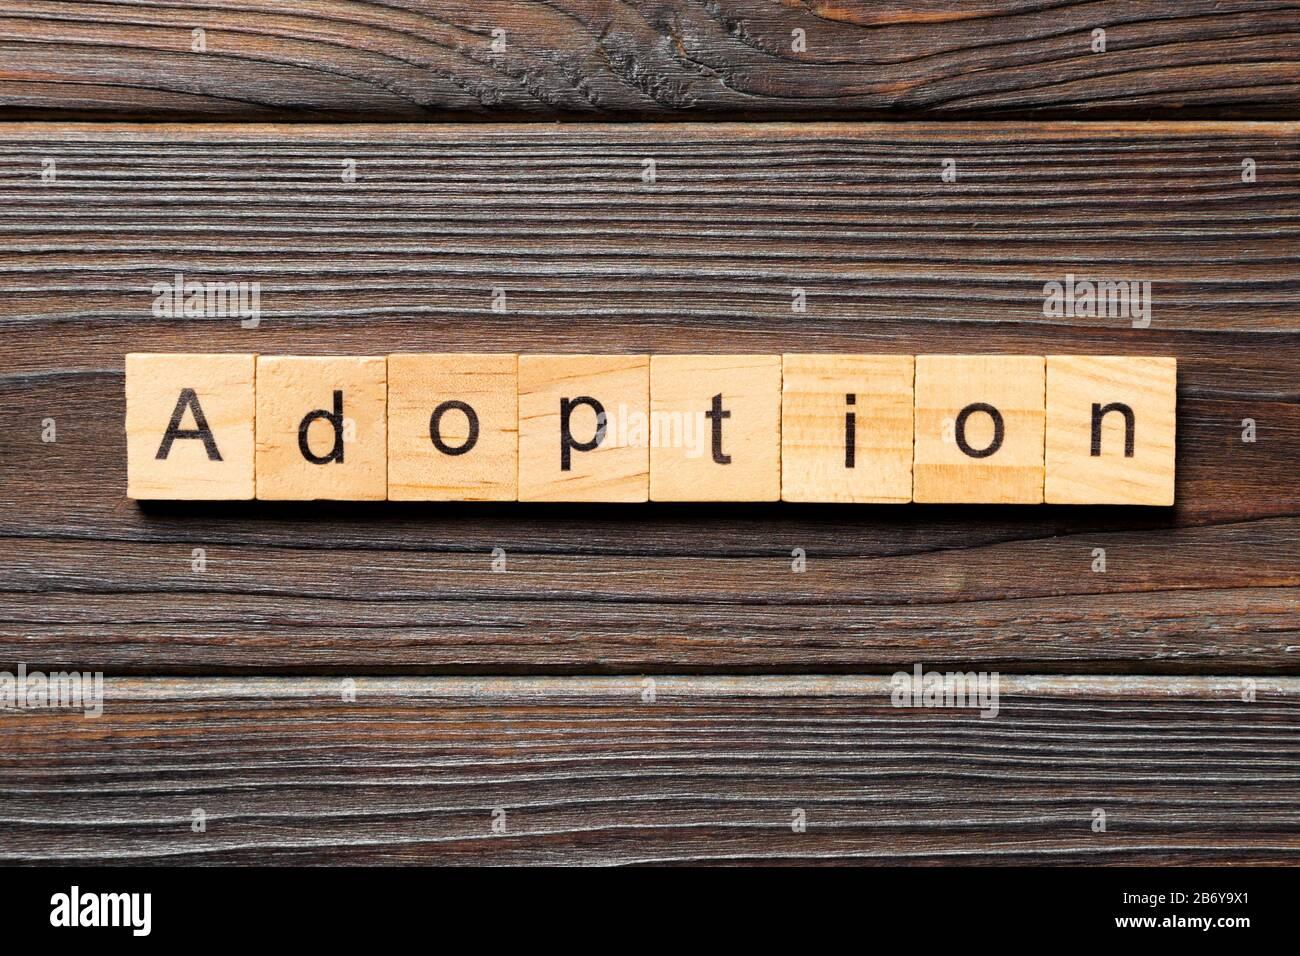 adoption word written on wood block. adoption text on table, concept. Stock Photo